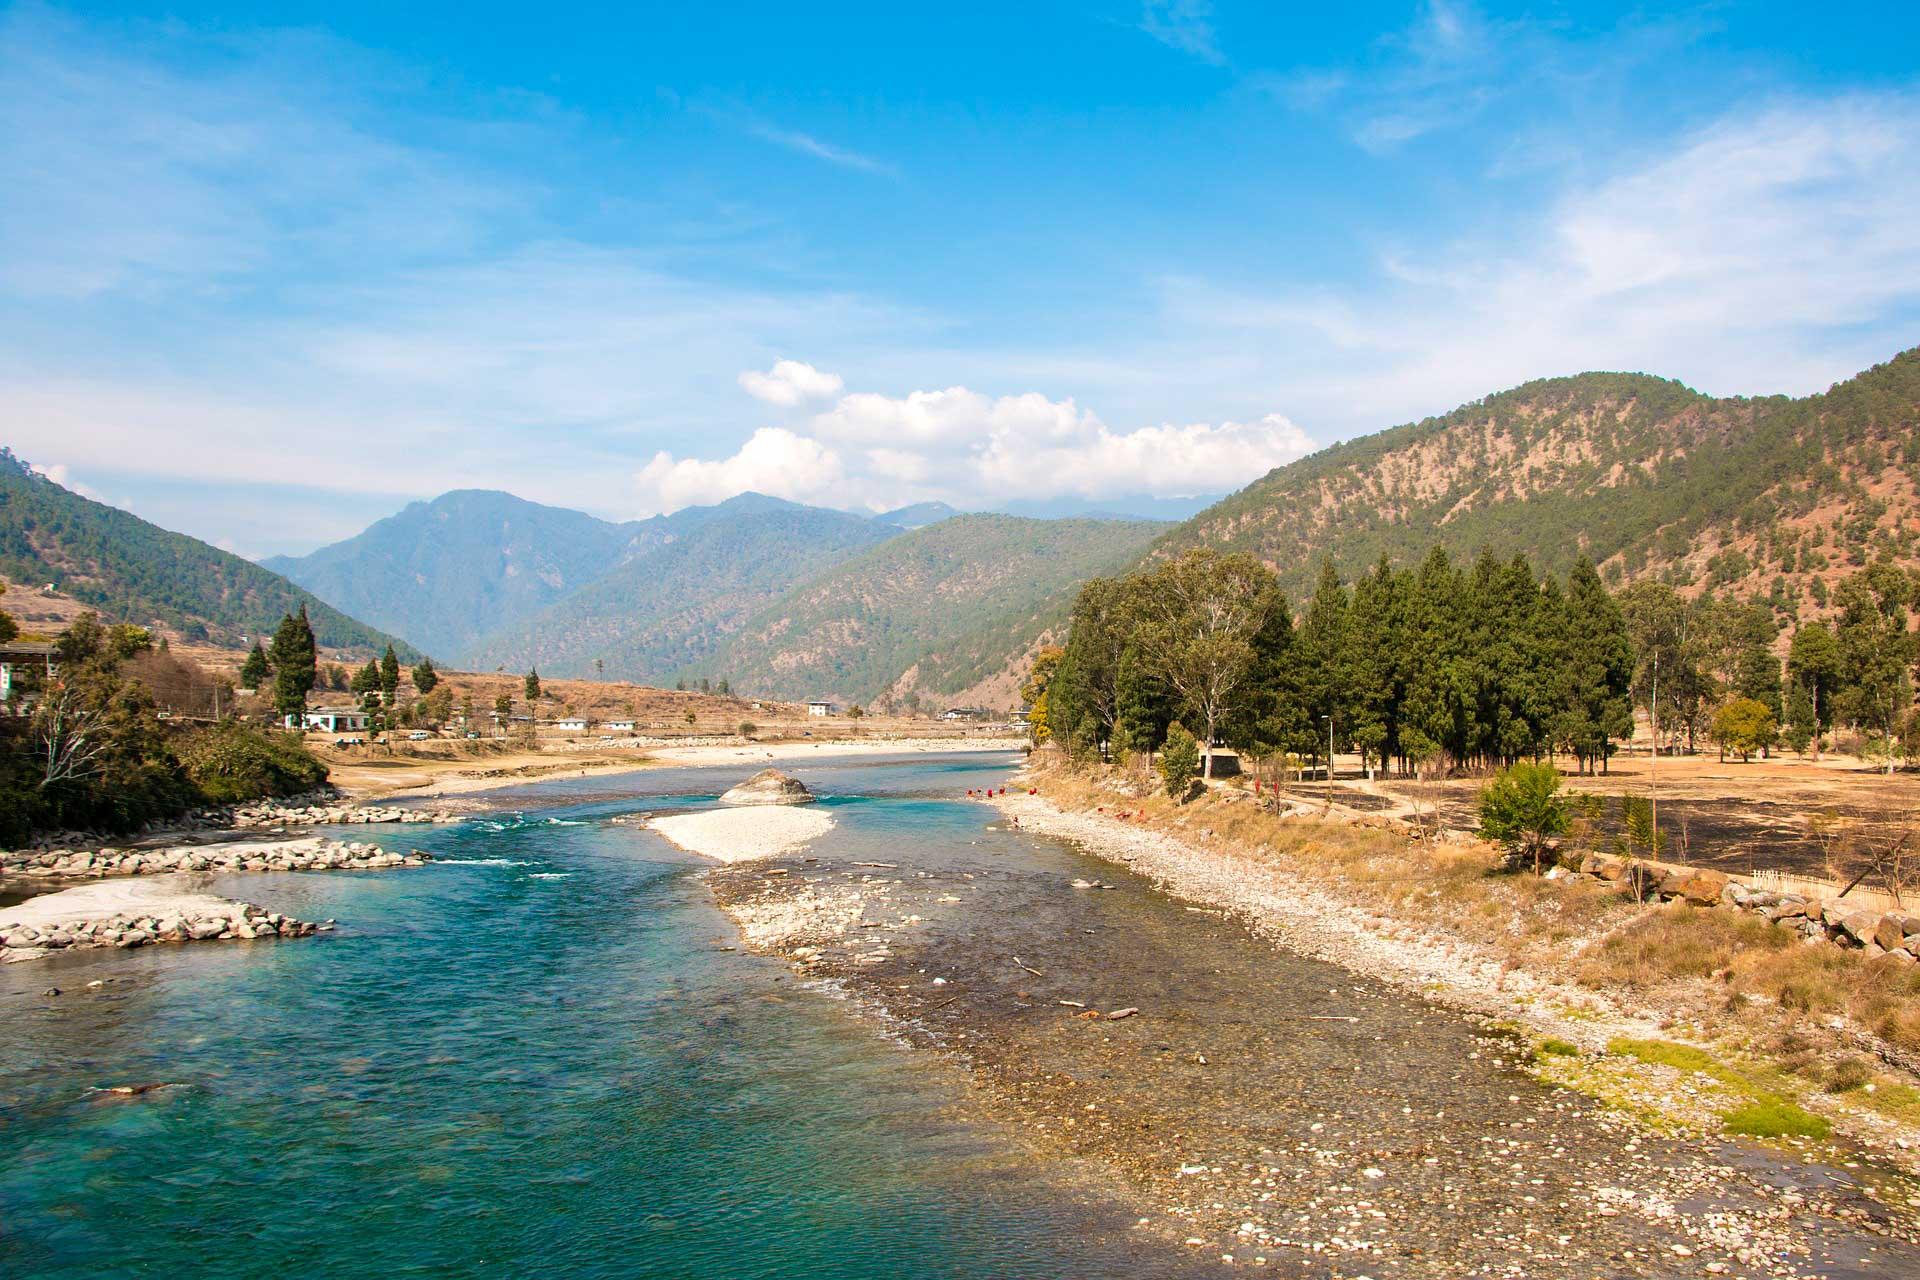 River view Bhutan